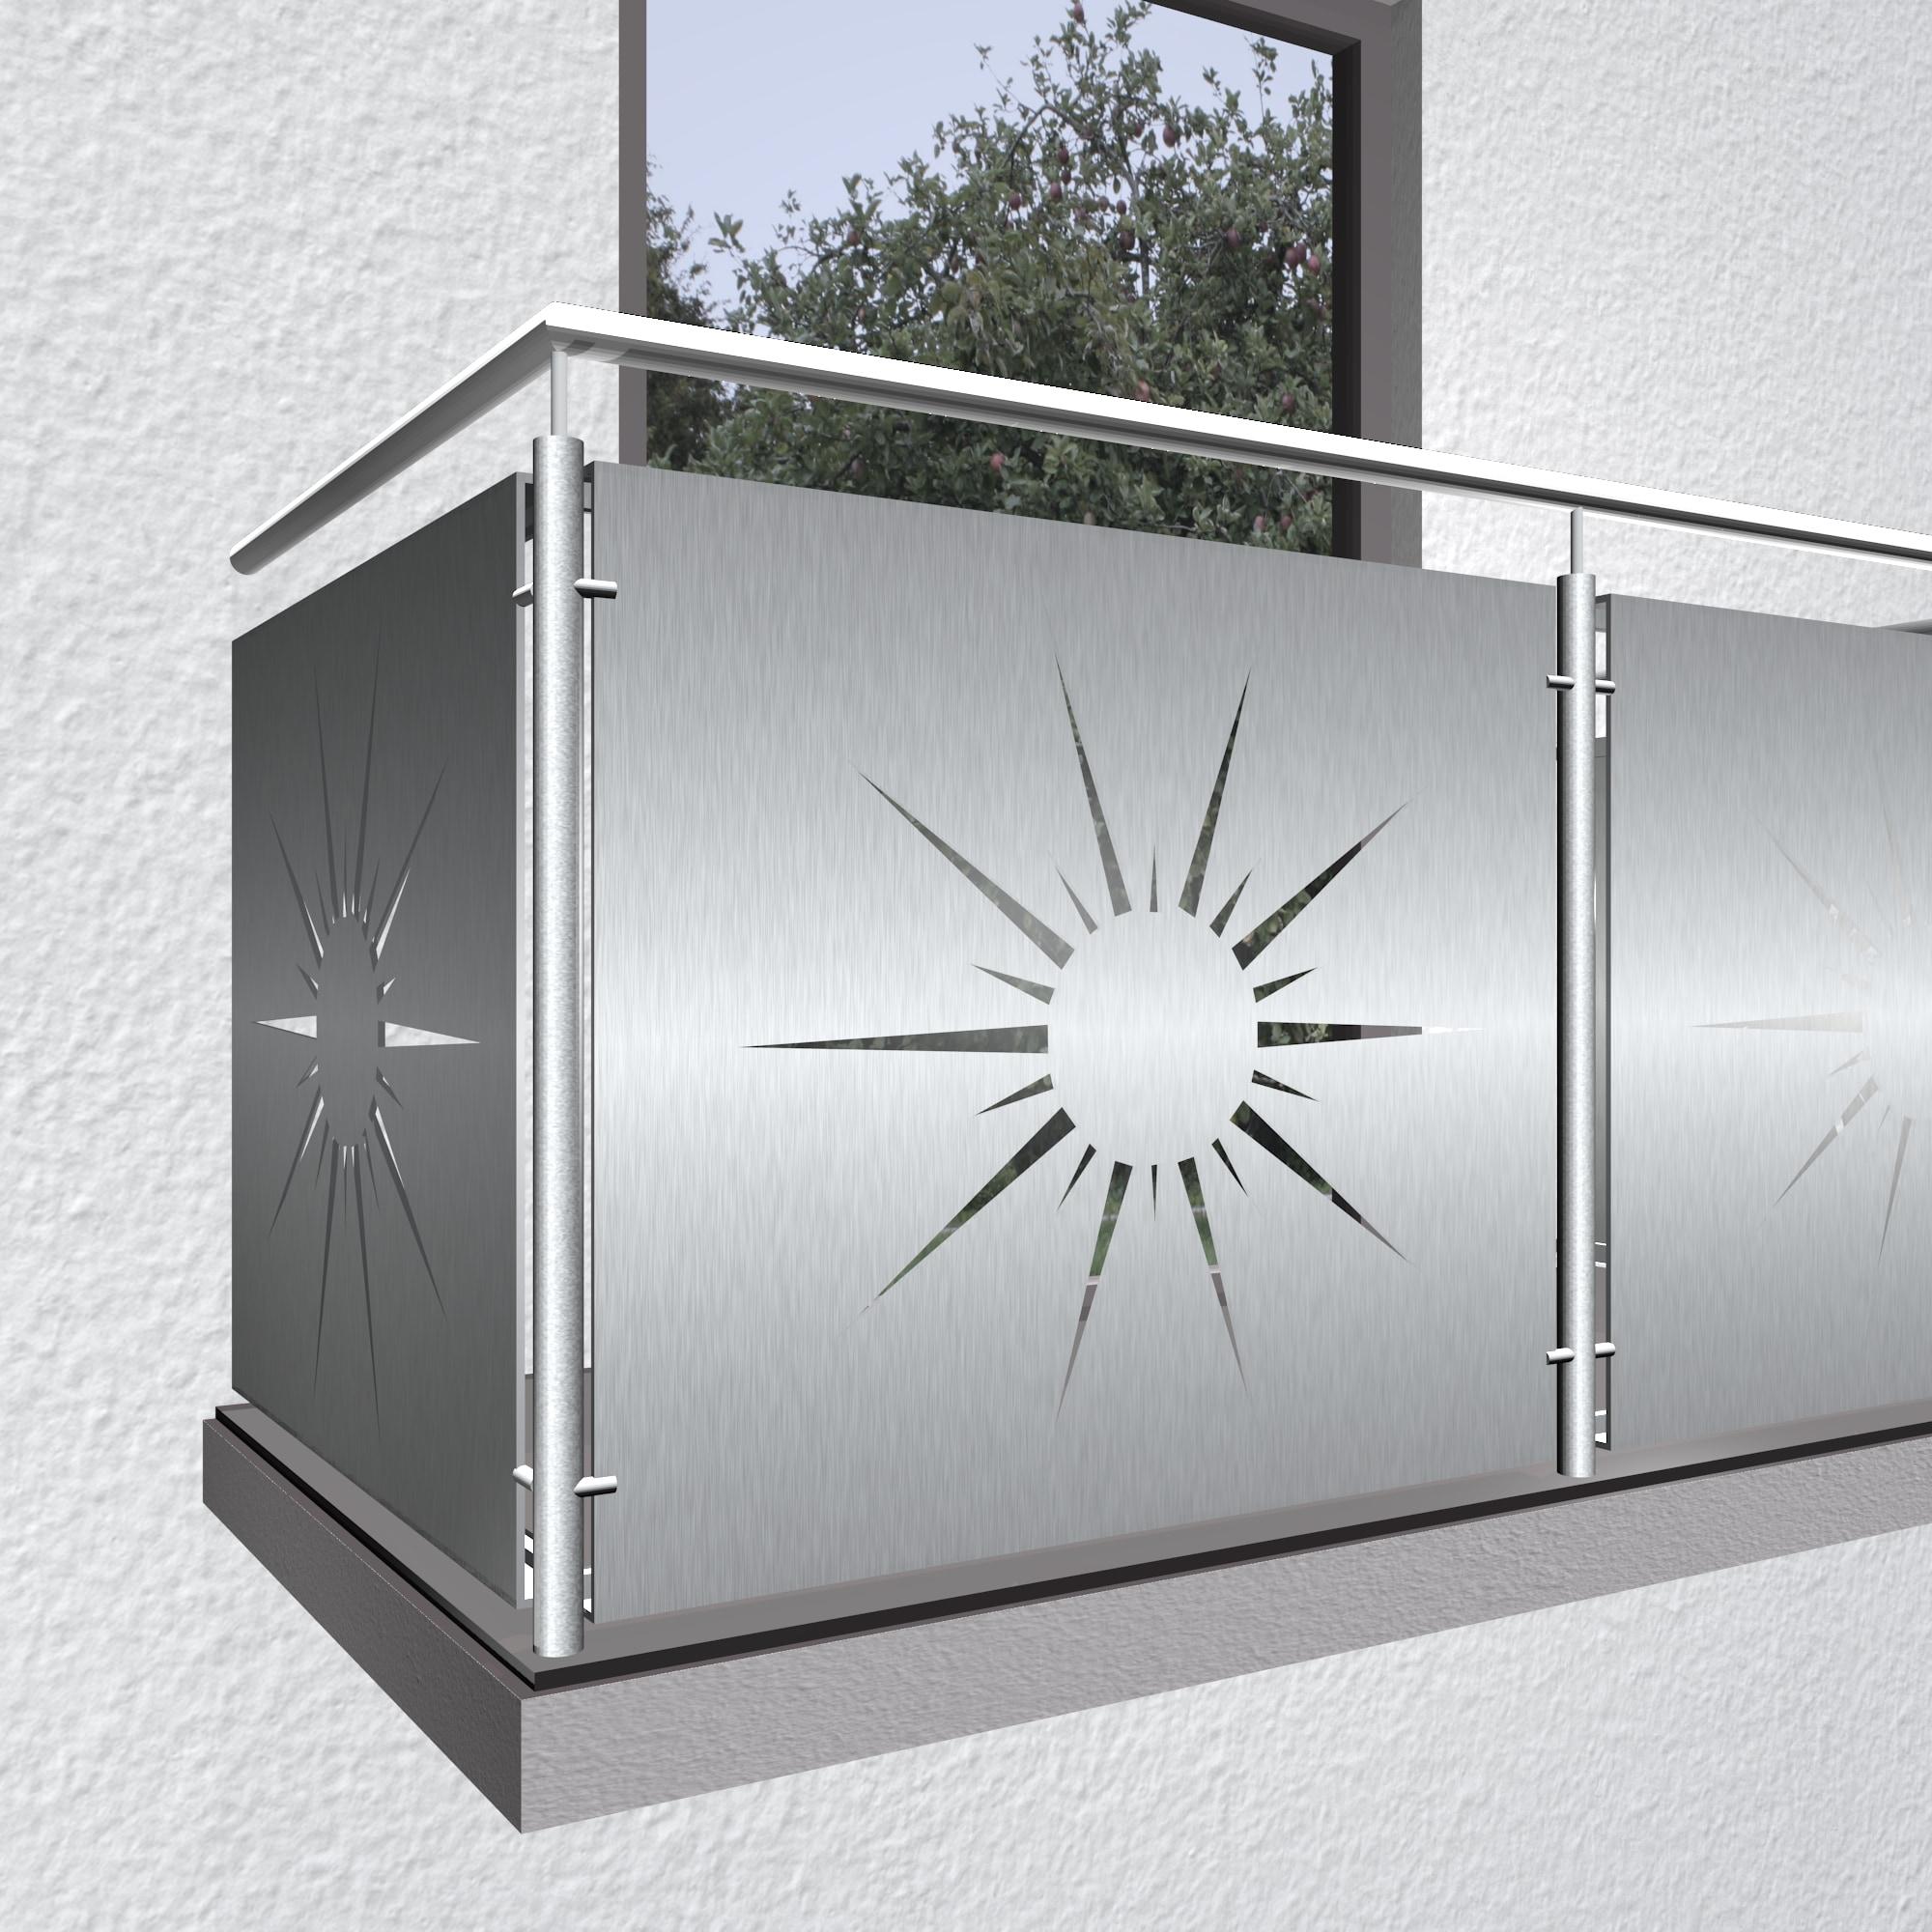 Balkonverkleidung Edelstahl SO